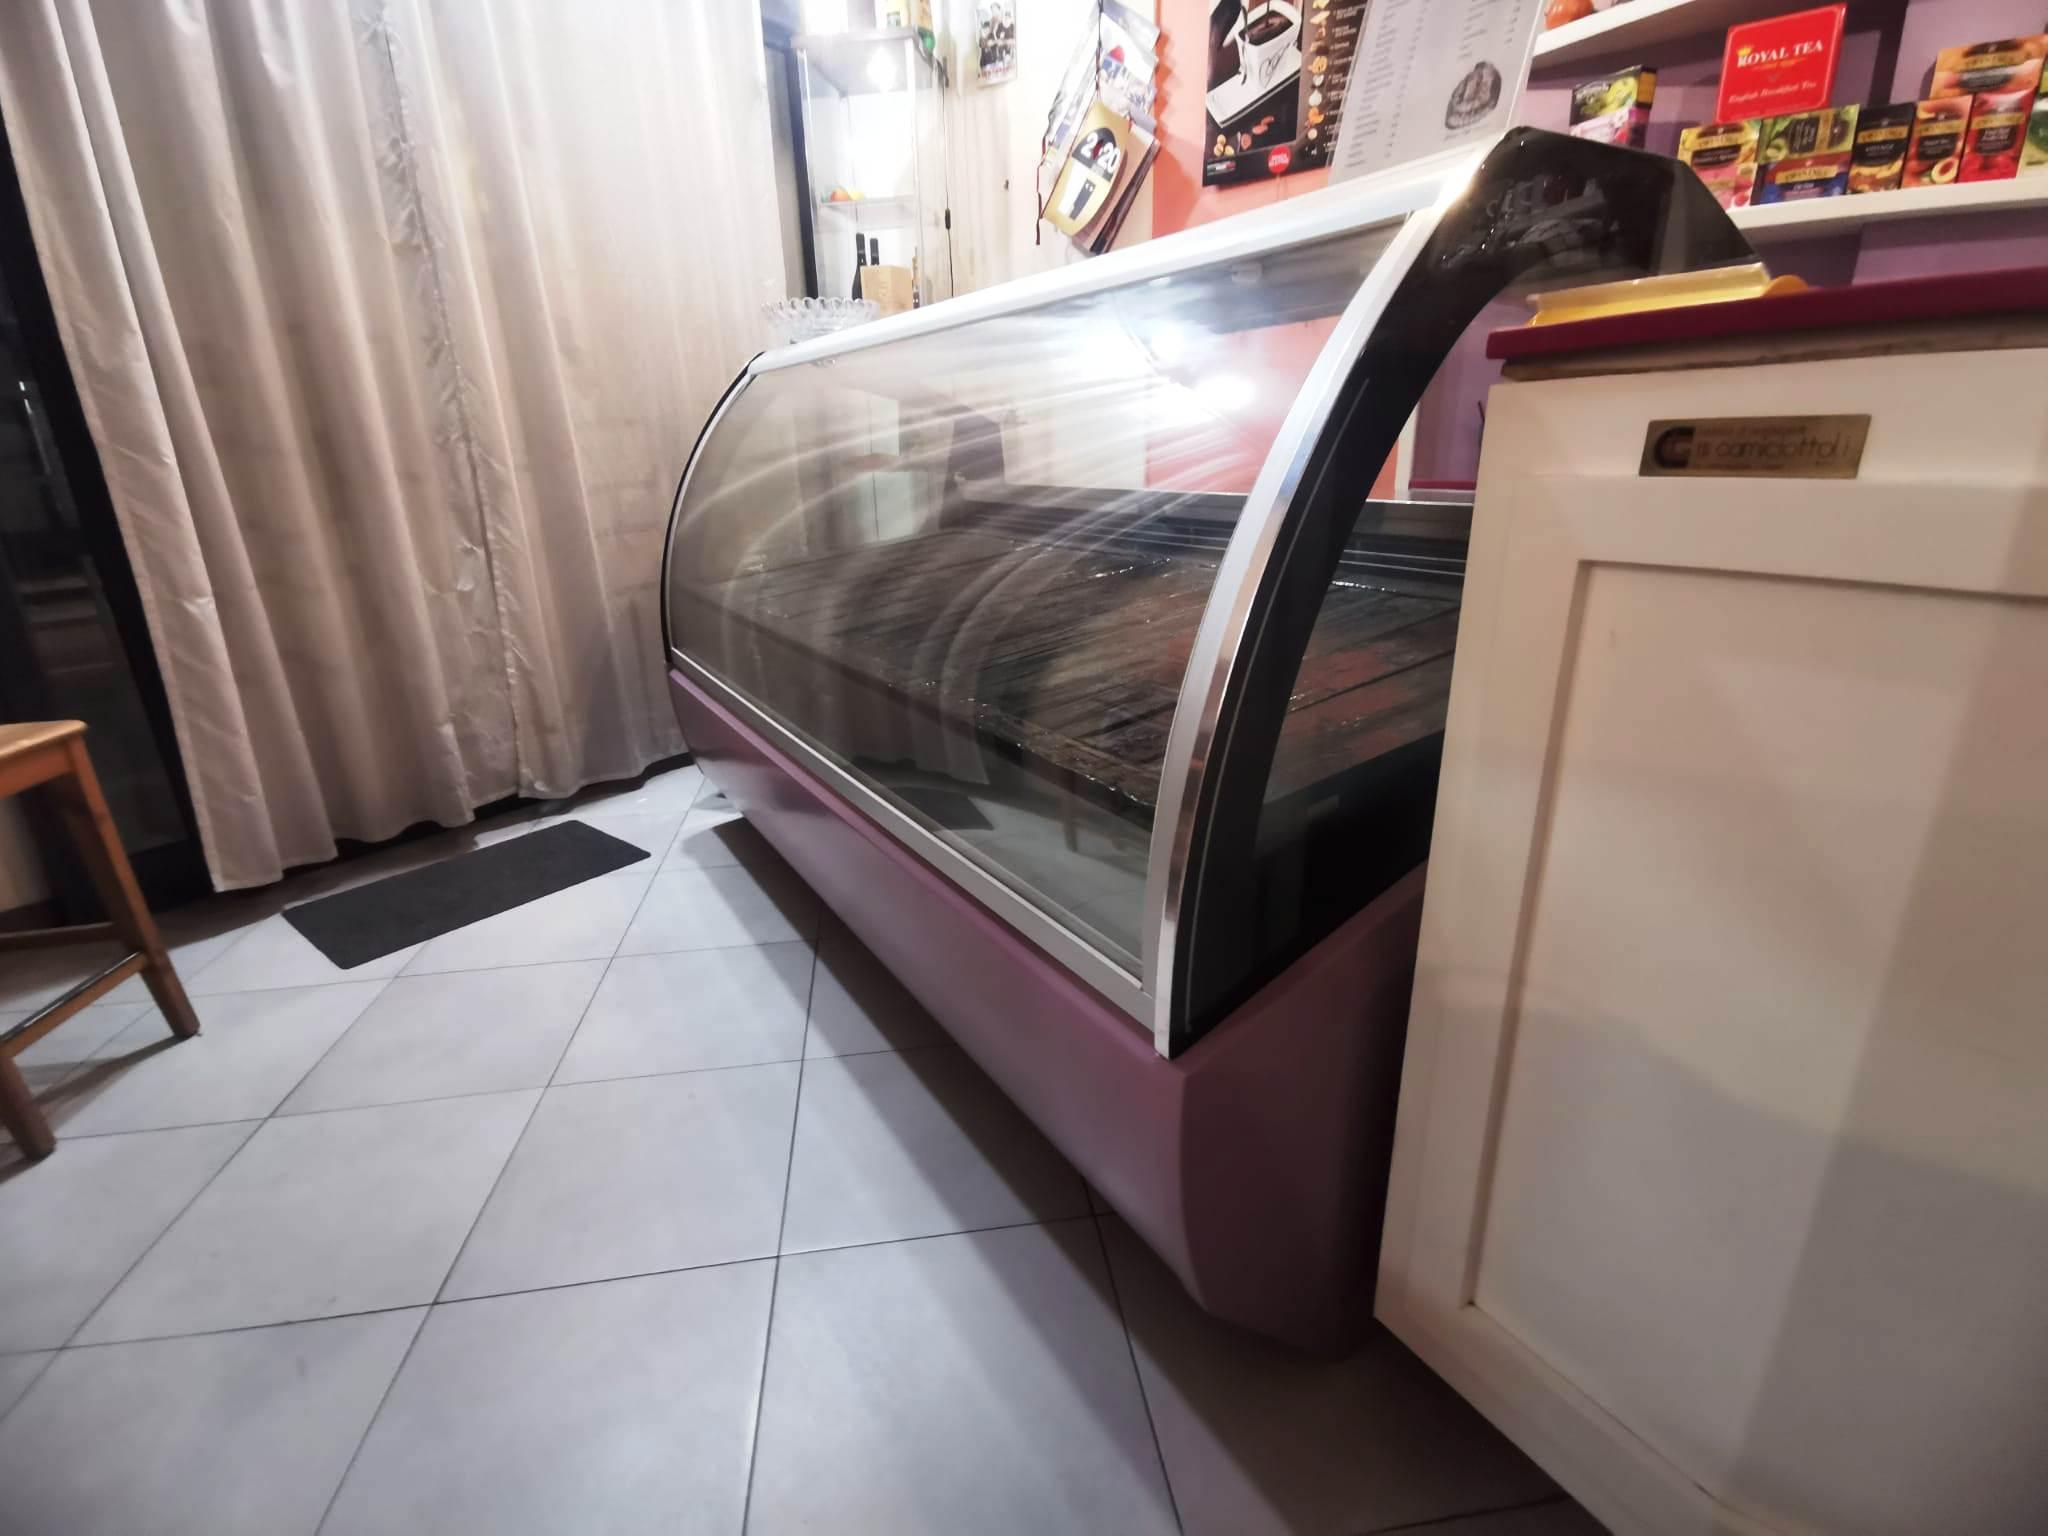 vetrina gelato proxima g12 fb in vendita - foto 3